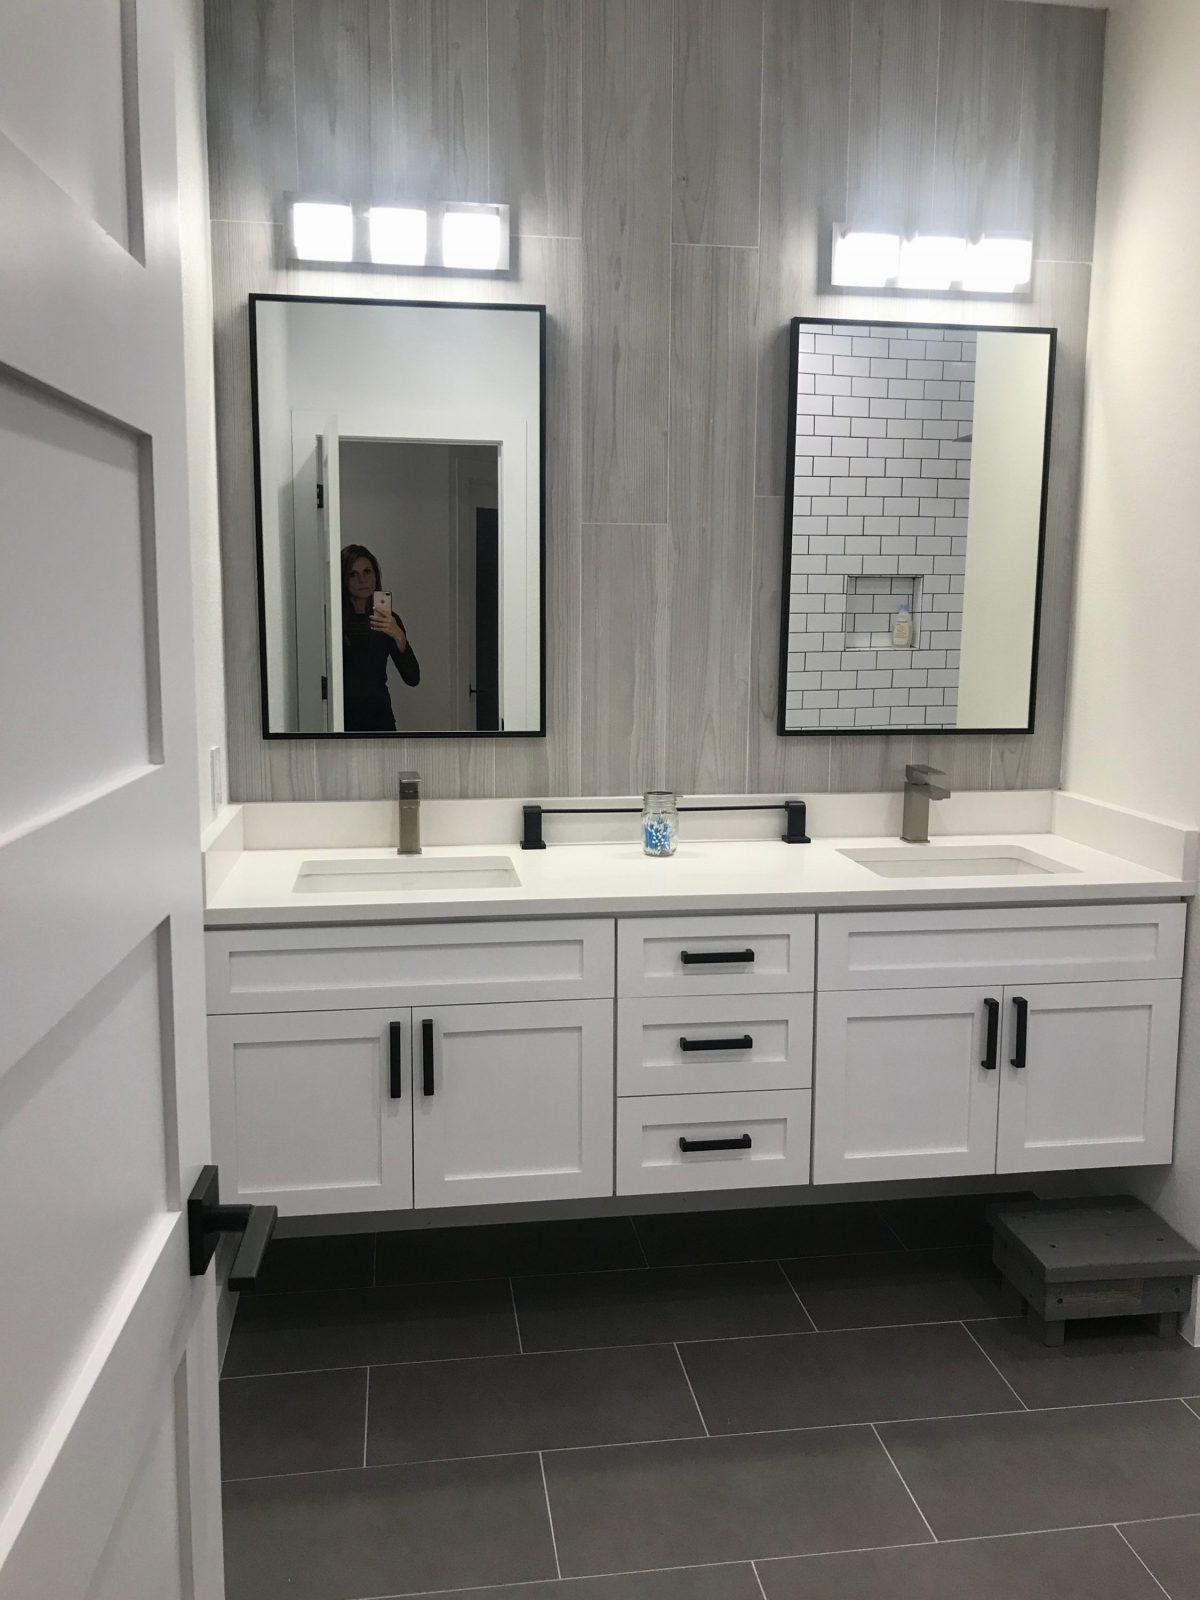 Bathroom Remodeling Southlake Tx Bathroom Remodel Southlake Tx  Gc Flooring Pros